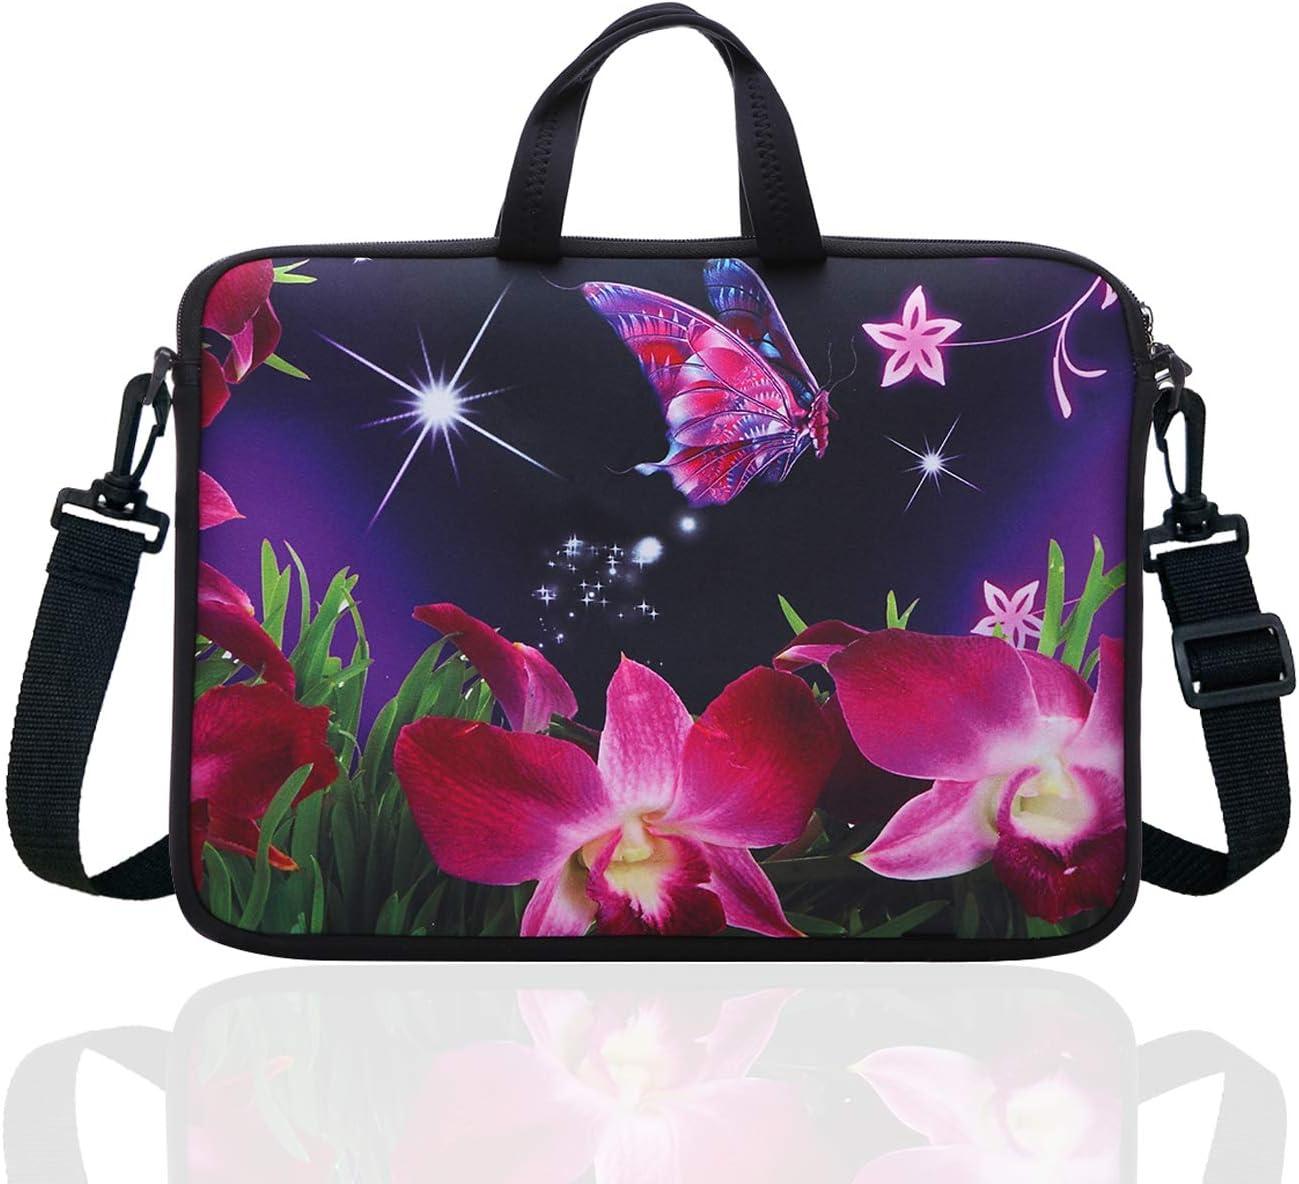 "14 Inch Neoprene Laptop Sleeve Case Bag with shoulder strap For 14"" Notebook/MacBook/Ultrabook/Chromebook (Pink flower)"